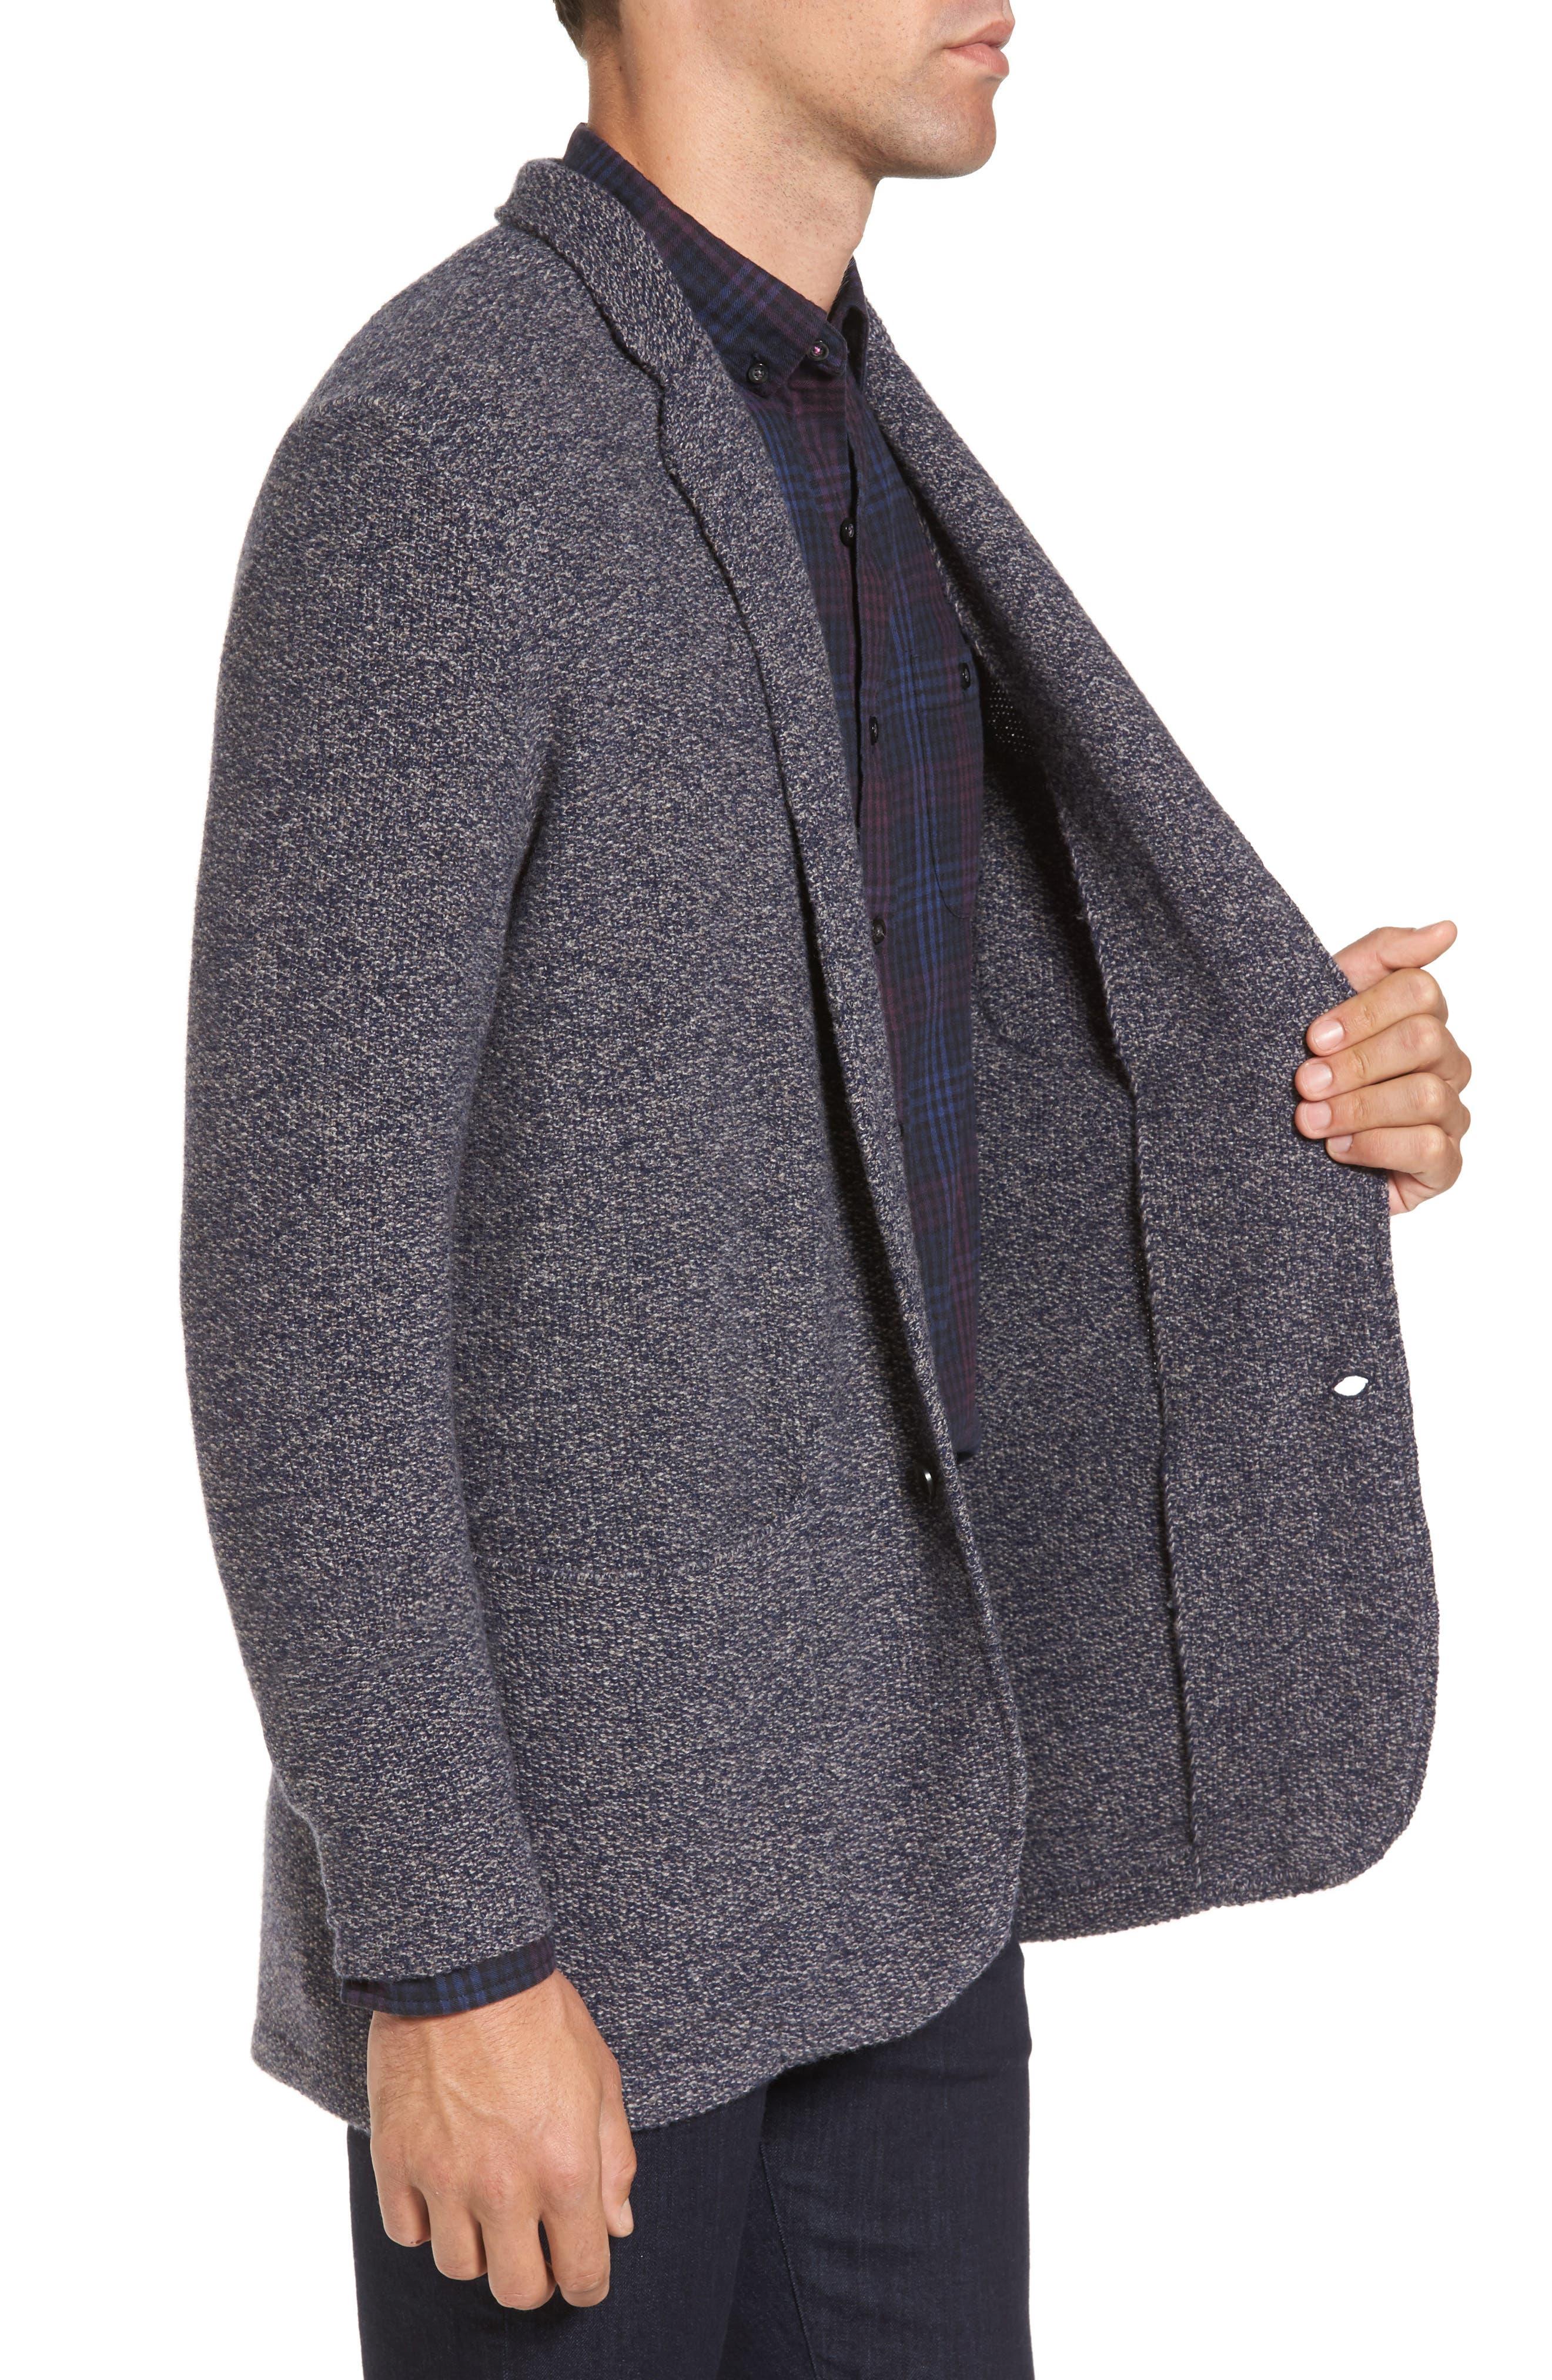 Deconstructed Merino & Yak Wool Sweater Jacket,                             Alternate thumbnail 3, color,                             416